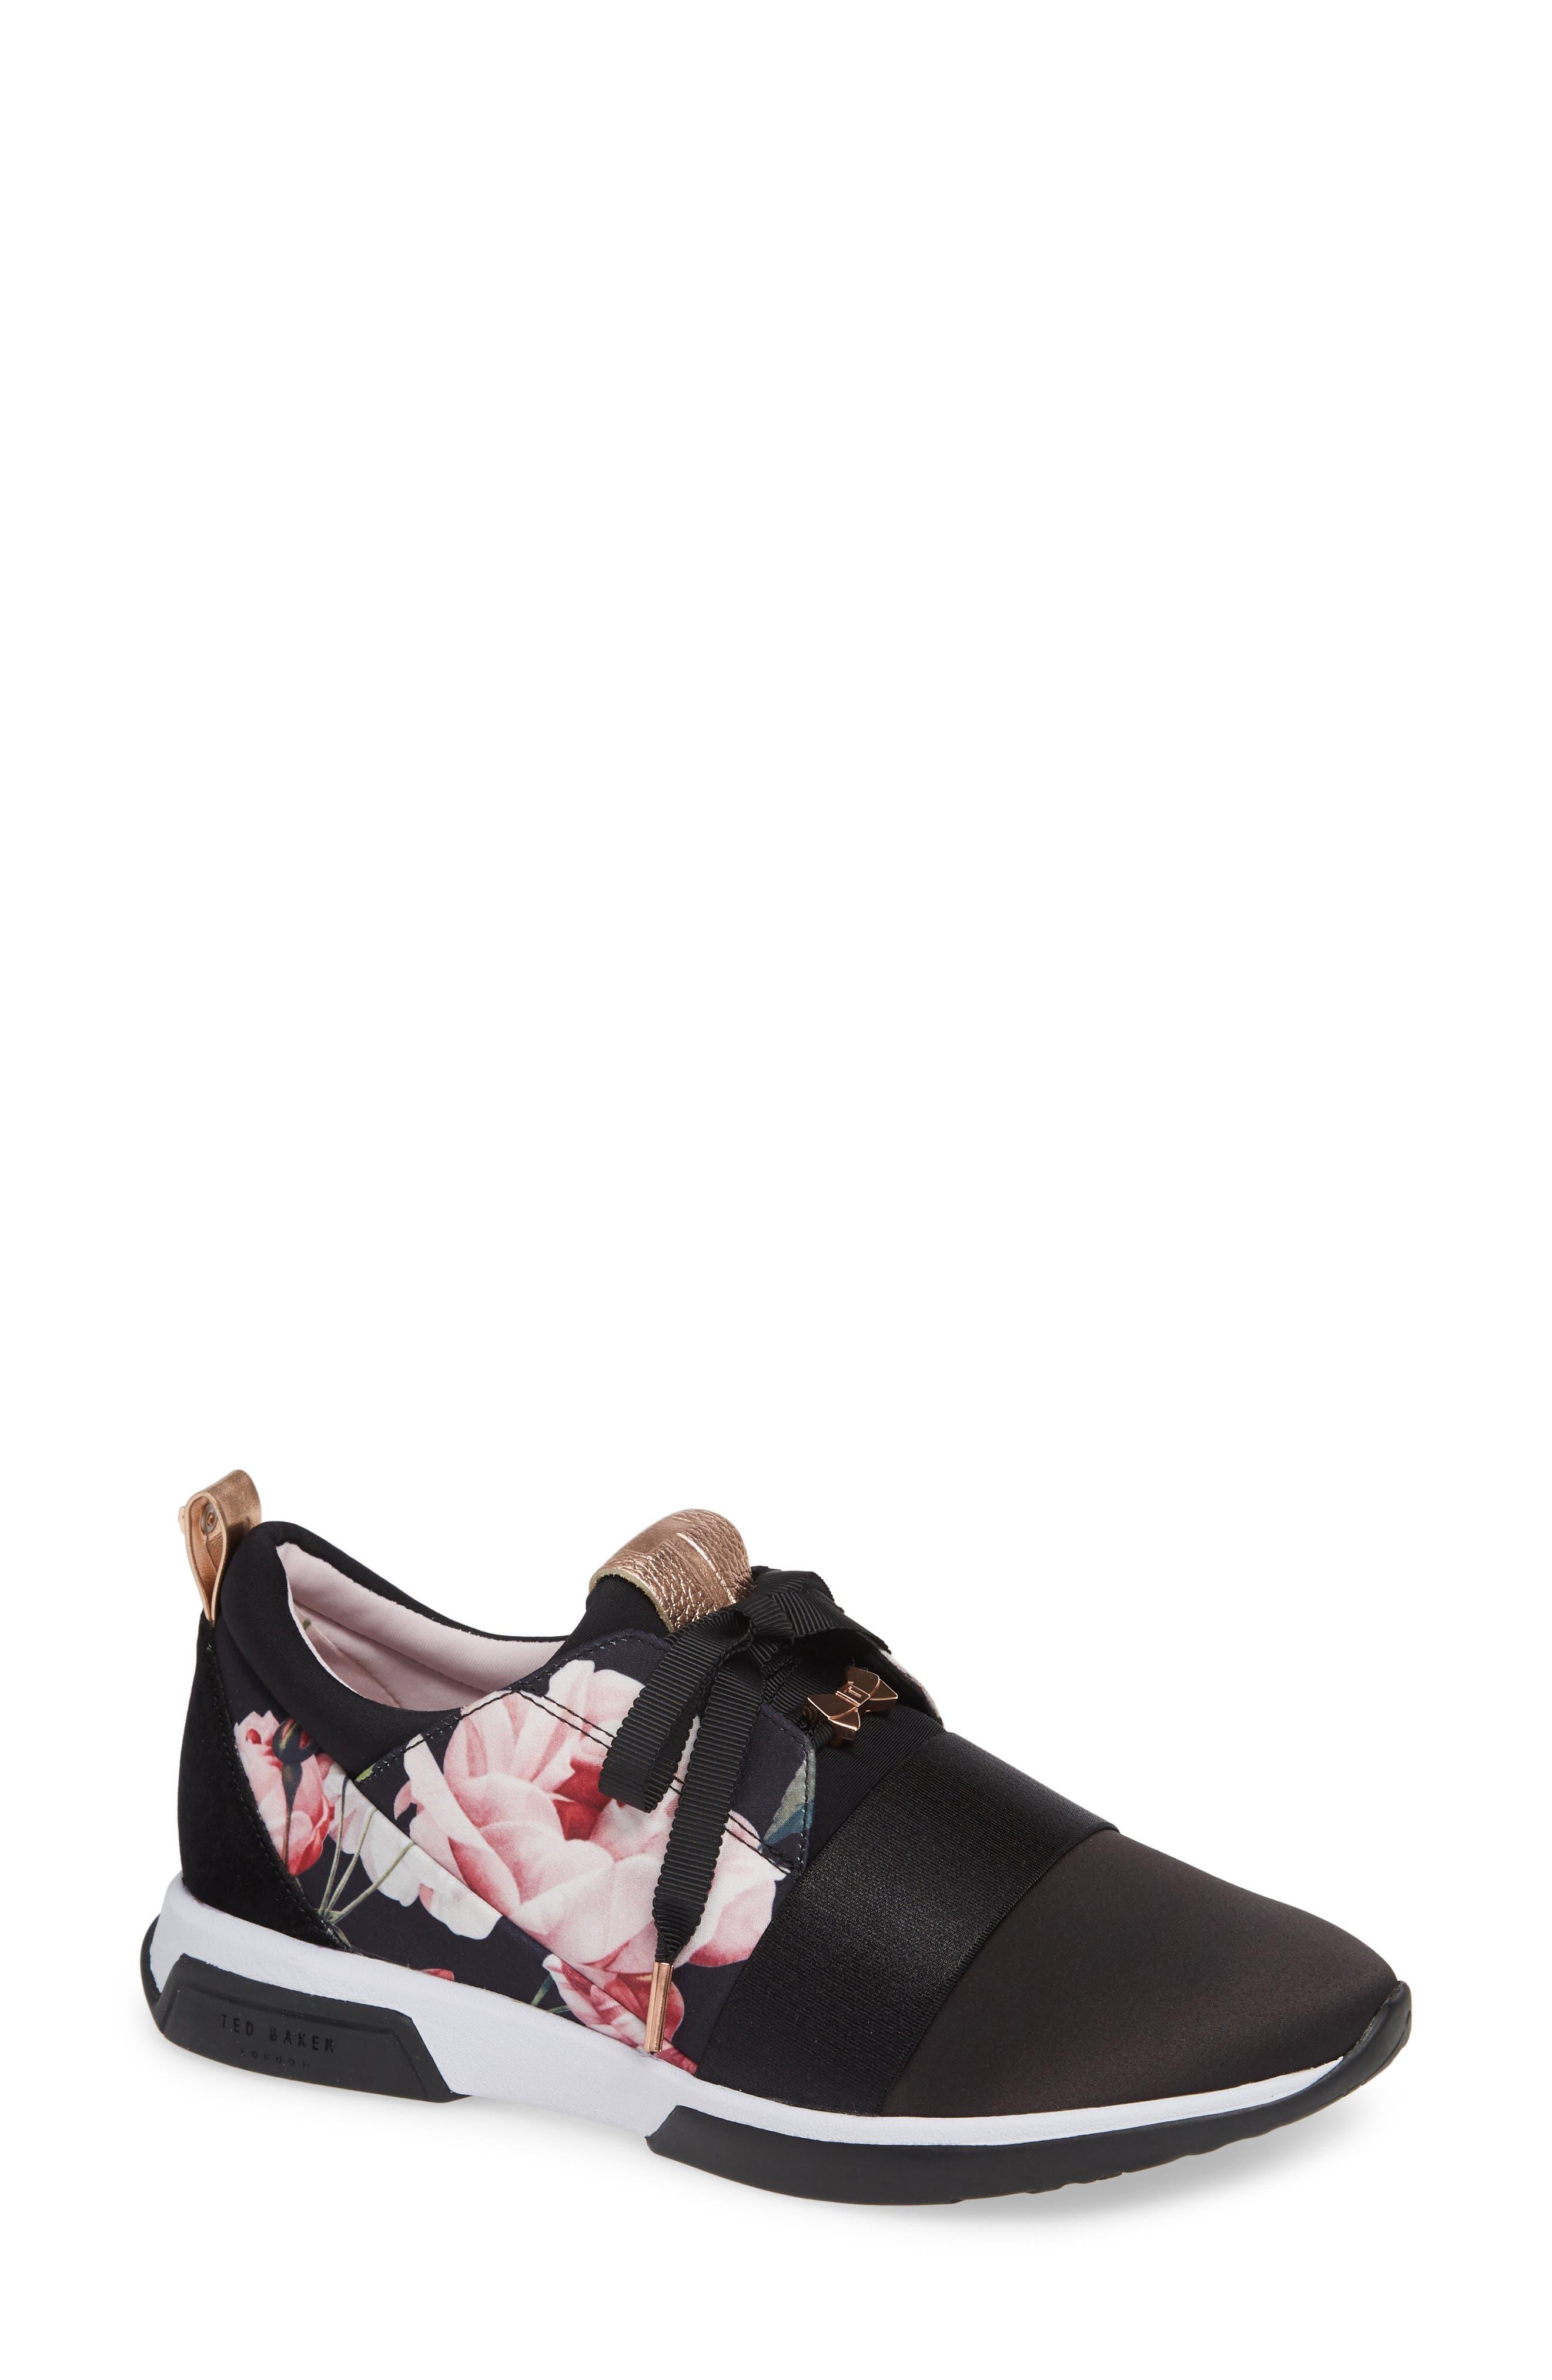 Cepap 2 Sneaker,                             Main thumbnail 1, color,                             001